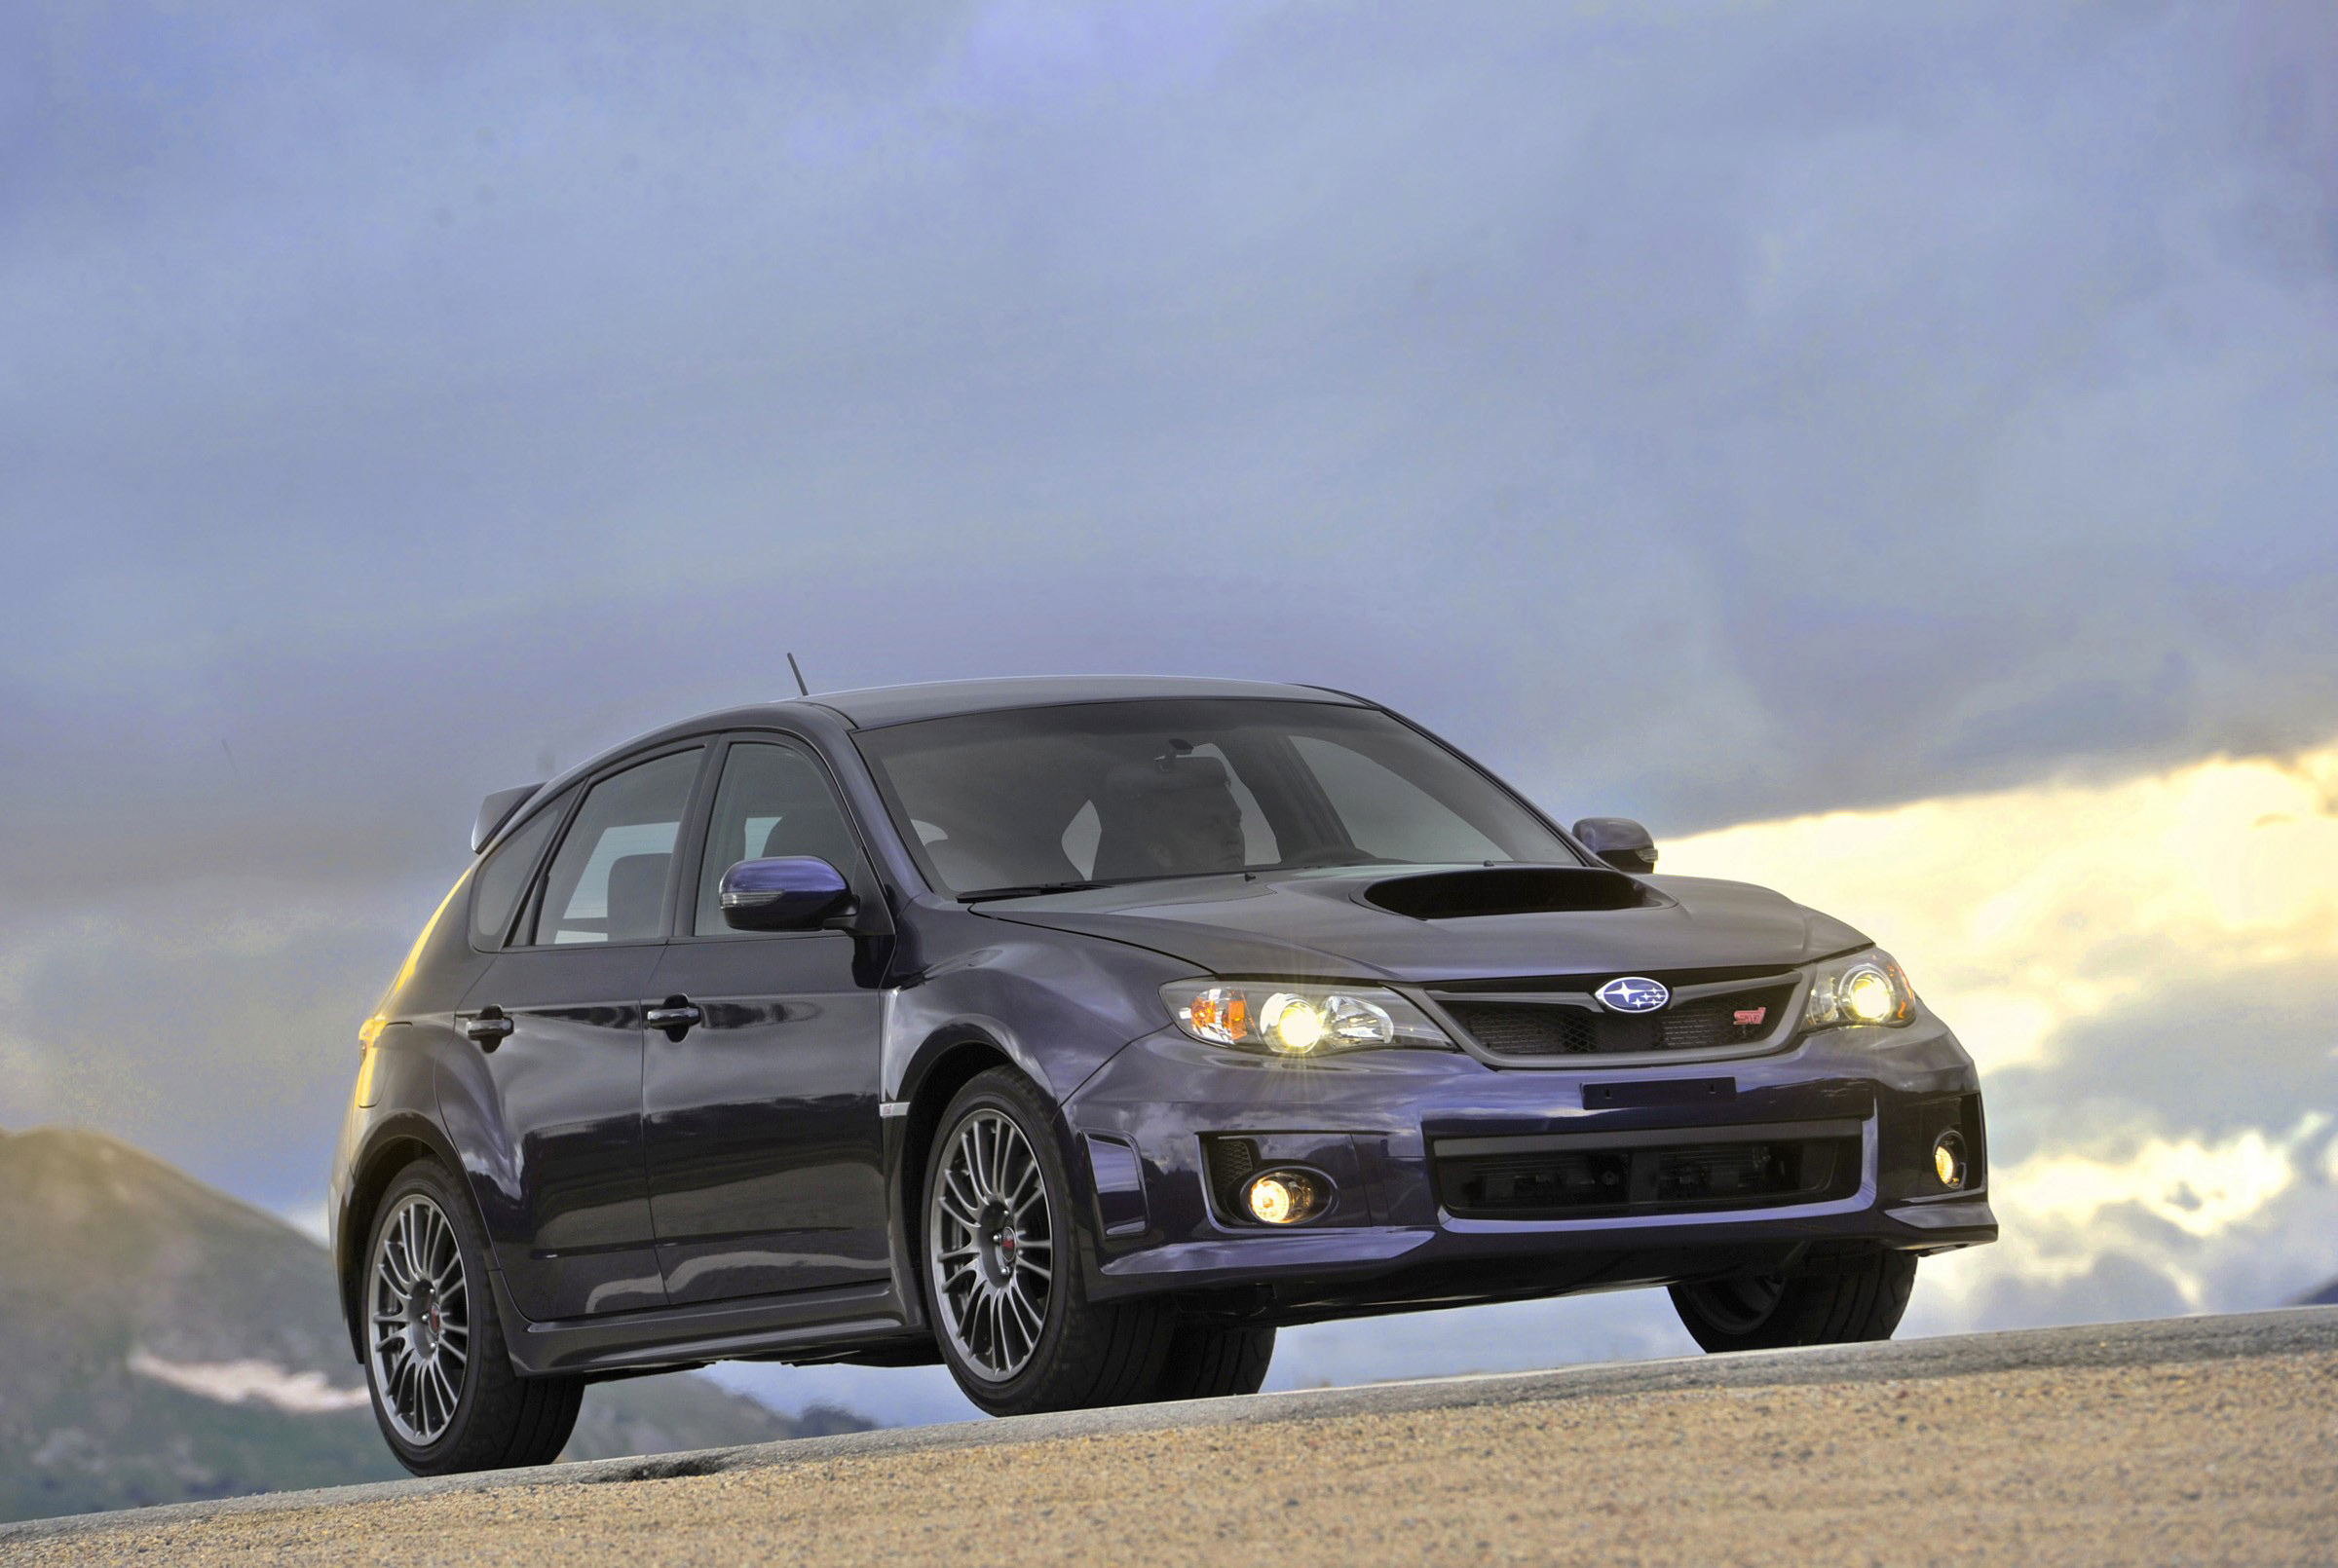 TrackWorthy - 2012 Subaru Impreza WRX STI 5 door